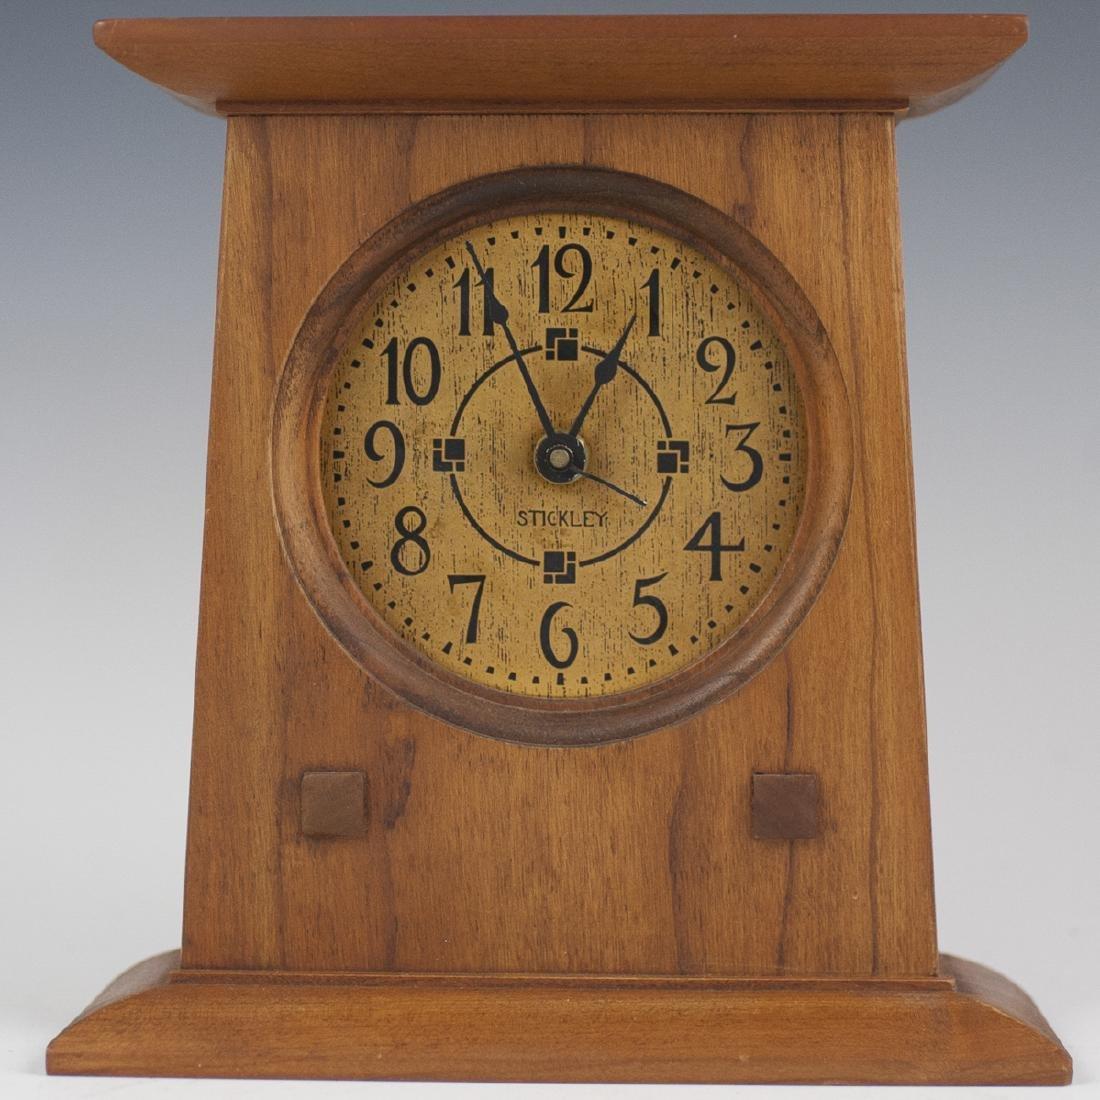 Vintage Stickley Wooden Mantel Clock